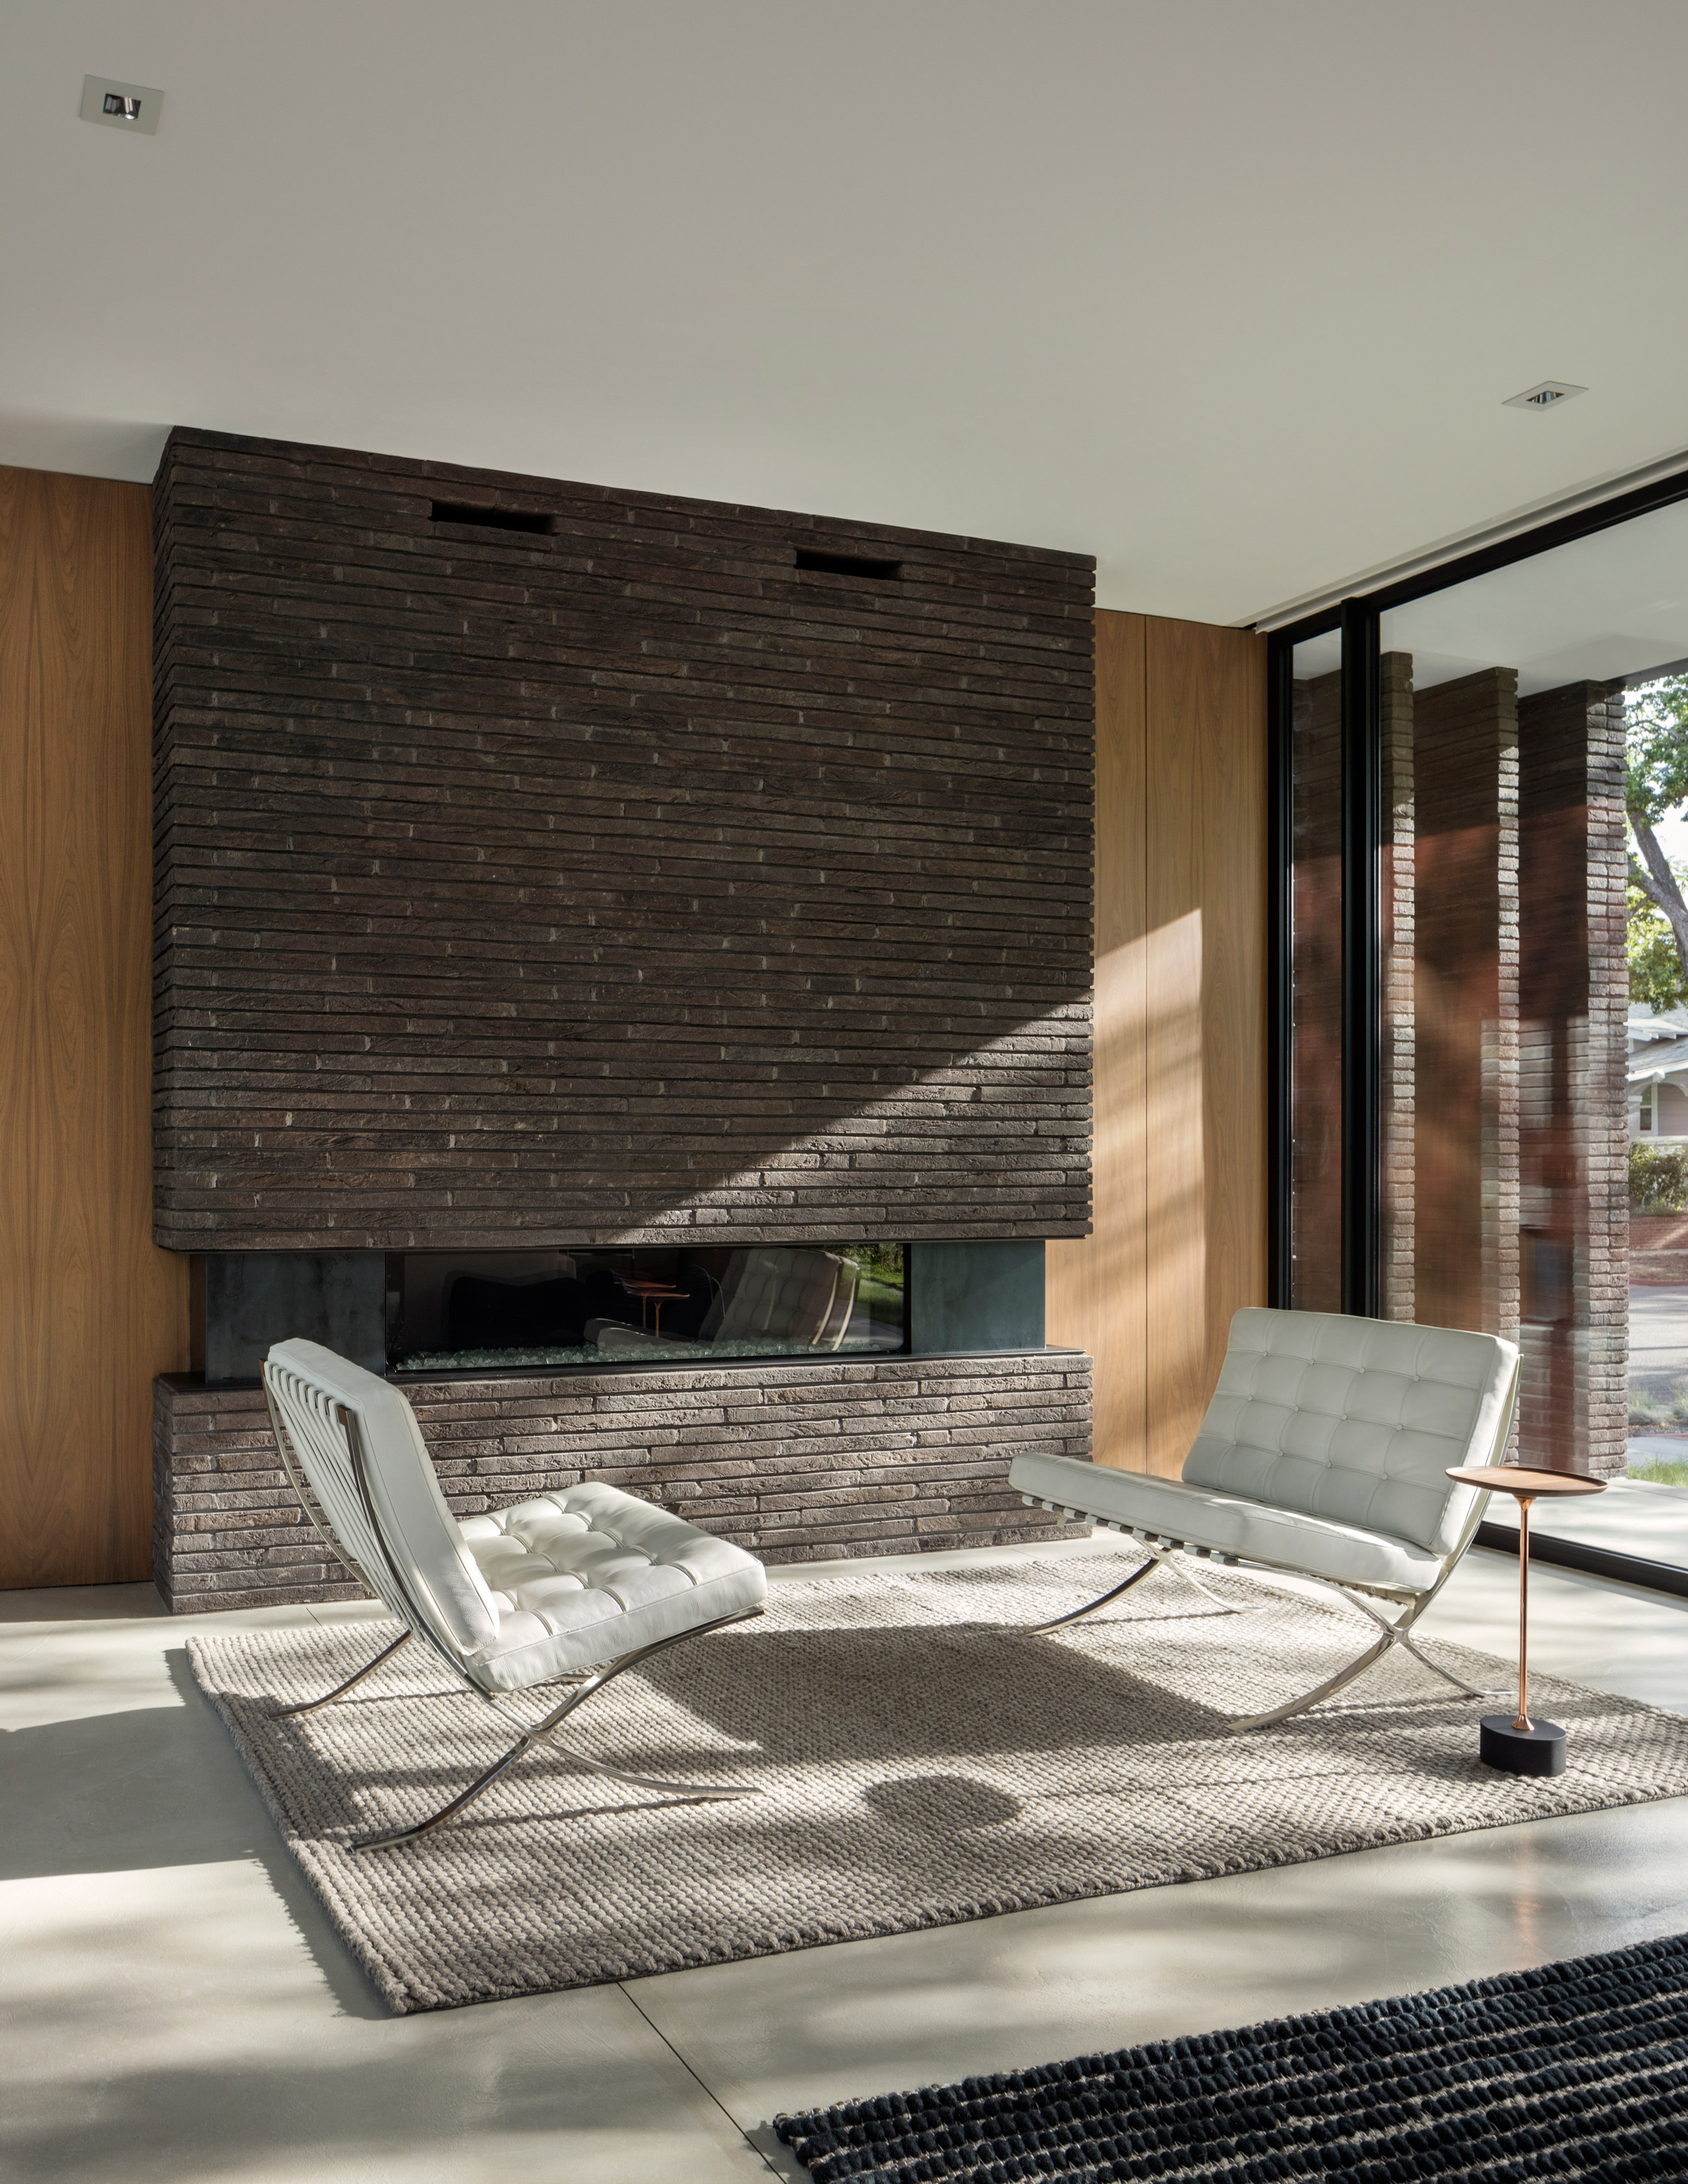 Brick City House by Studio B